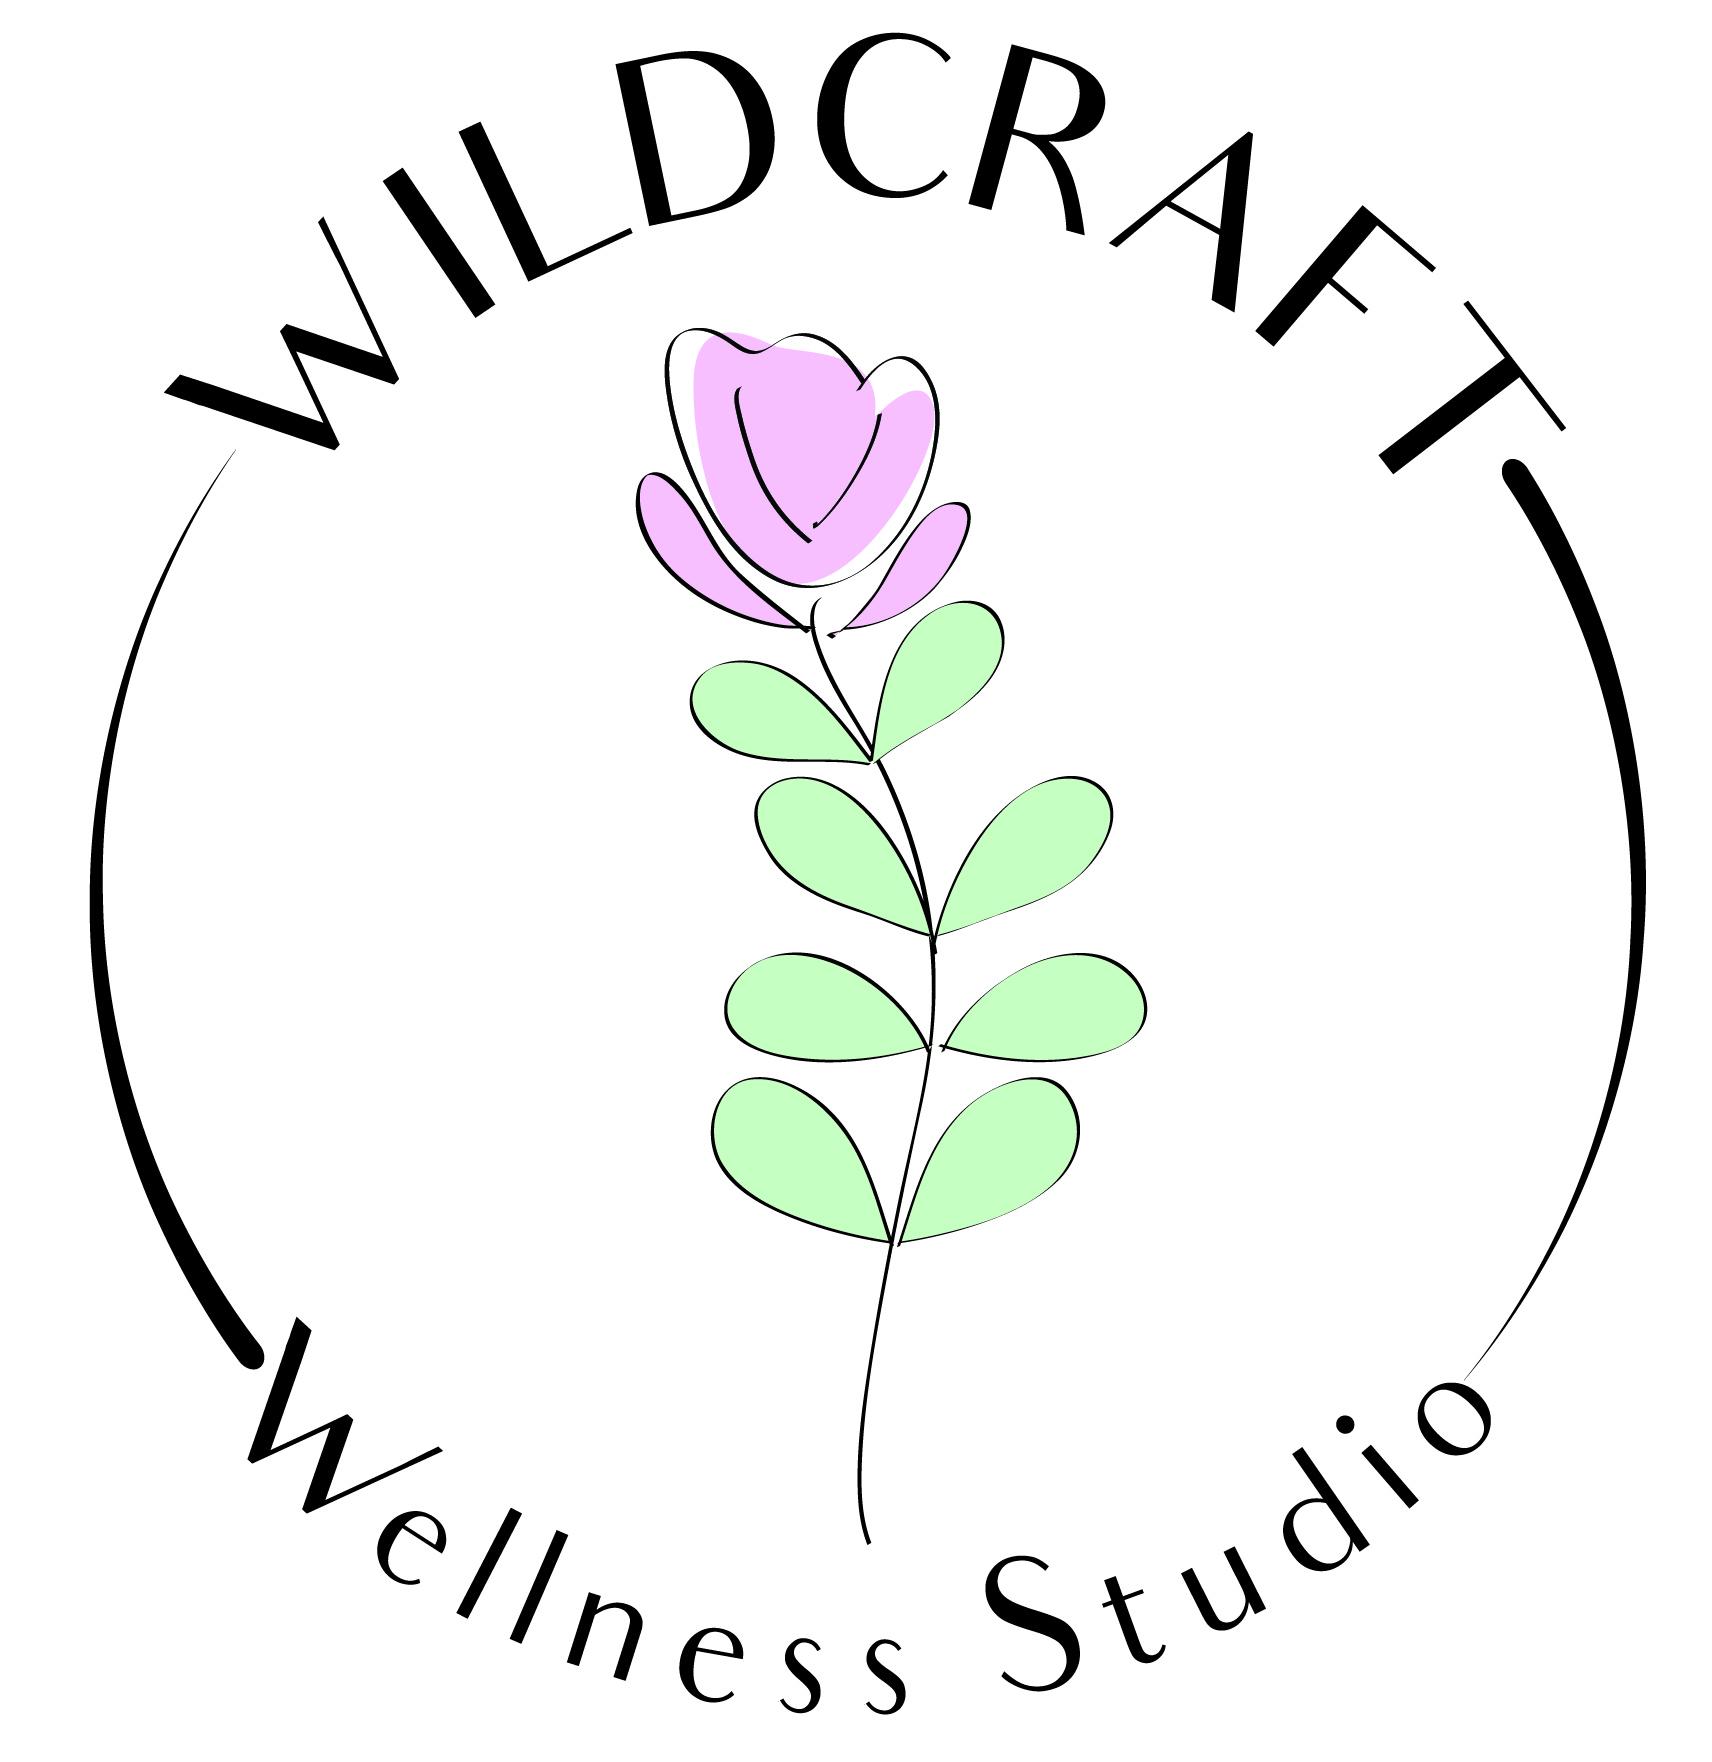 Upmarket, Elegant Logo Design for Wildcraft Wellness Studio.